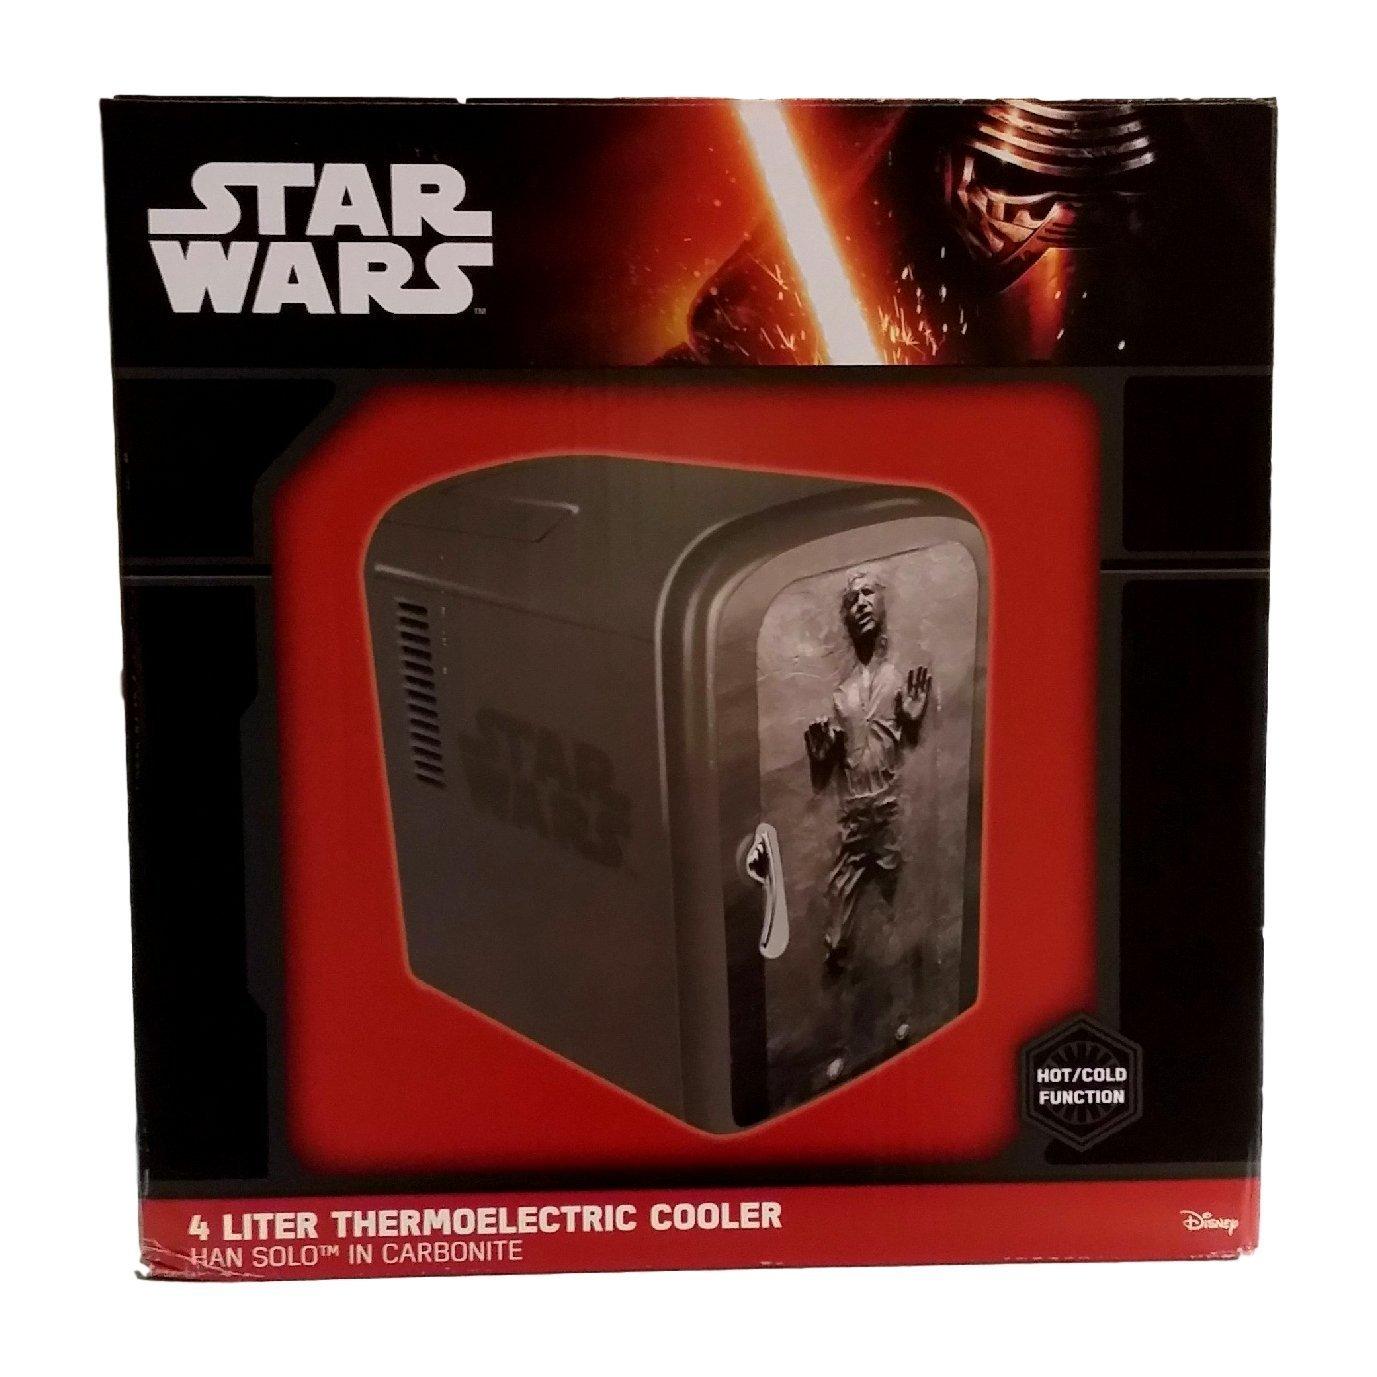 Star Wars New World Premier HAN Mini Kühlschrank: Amazon.de: Küche ...